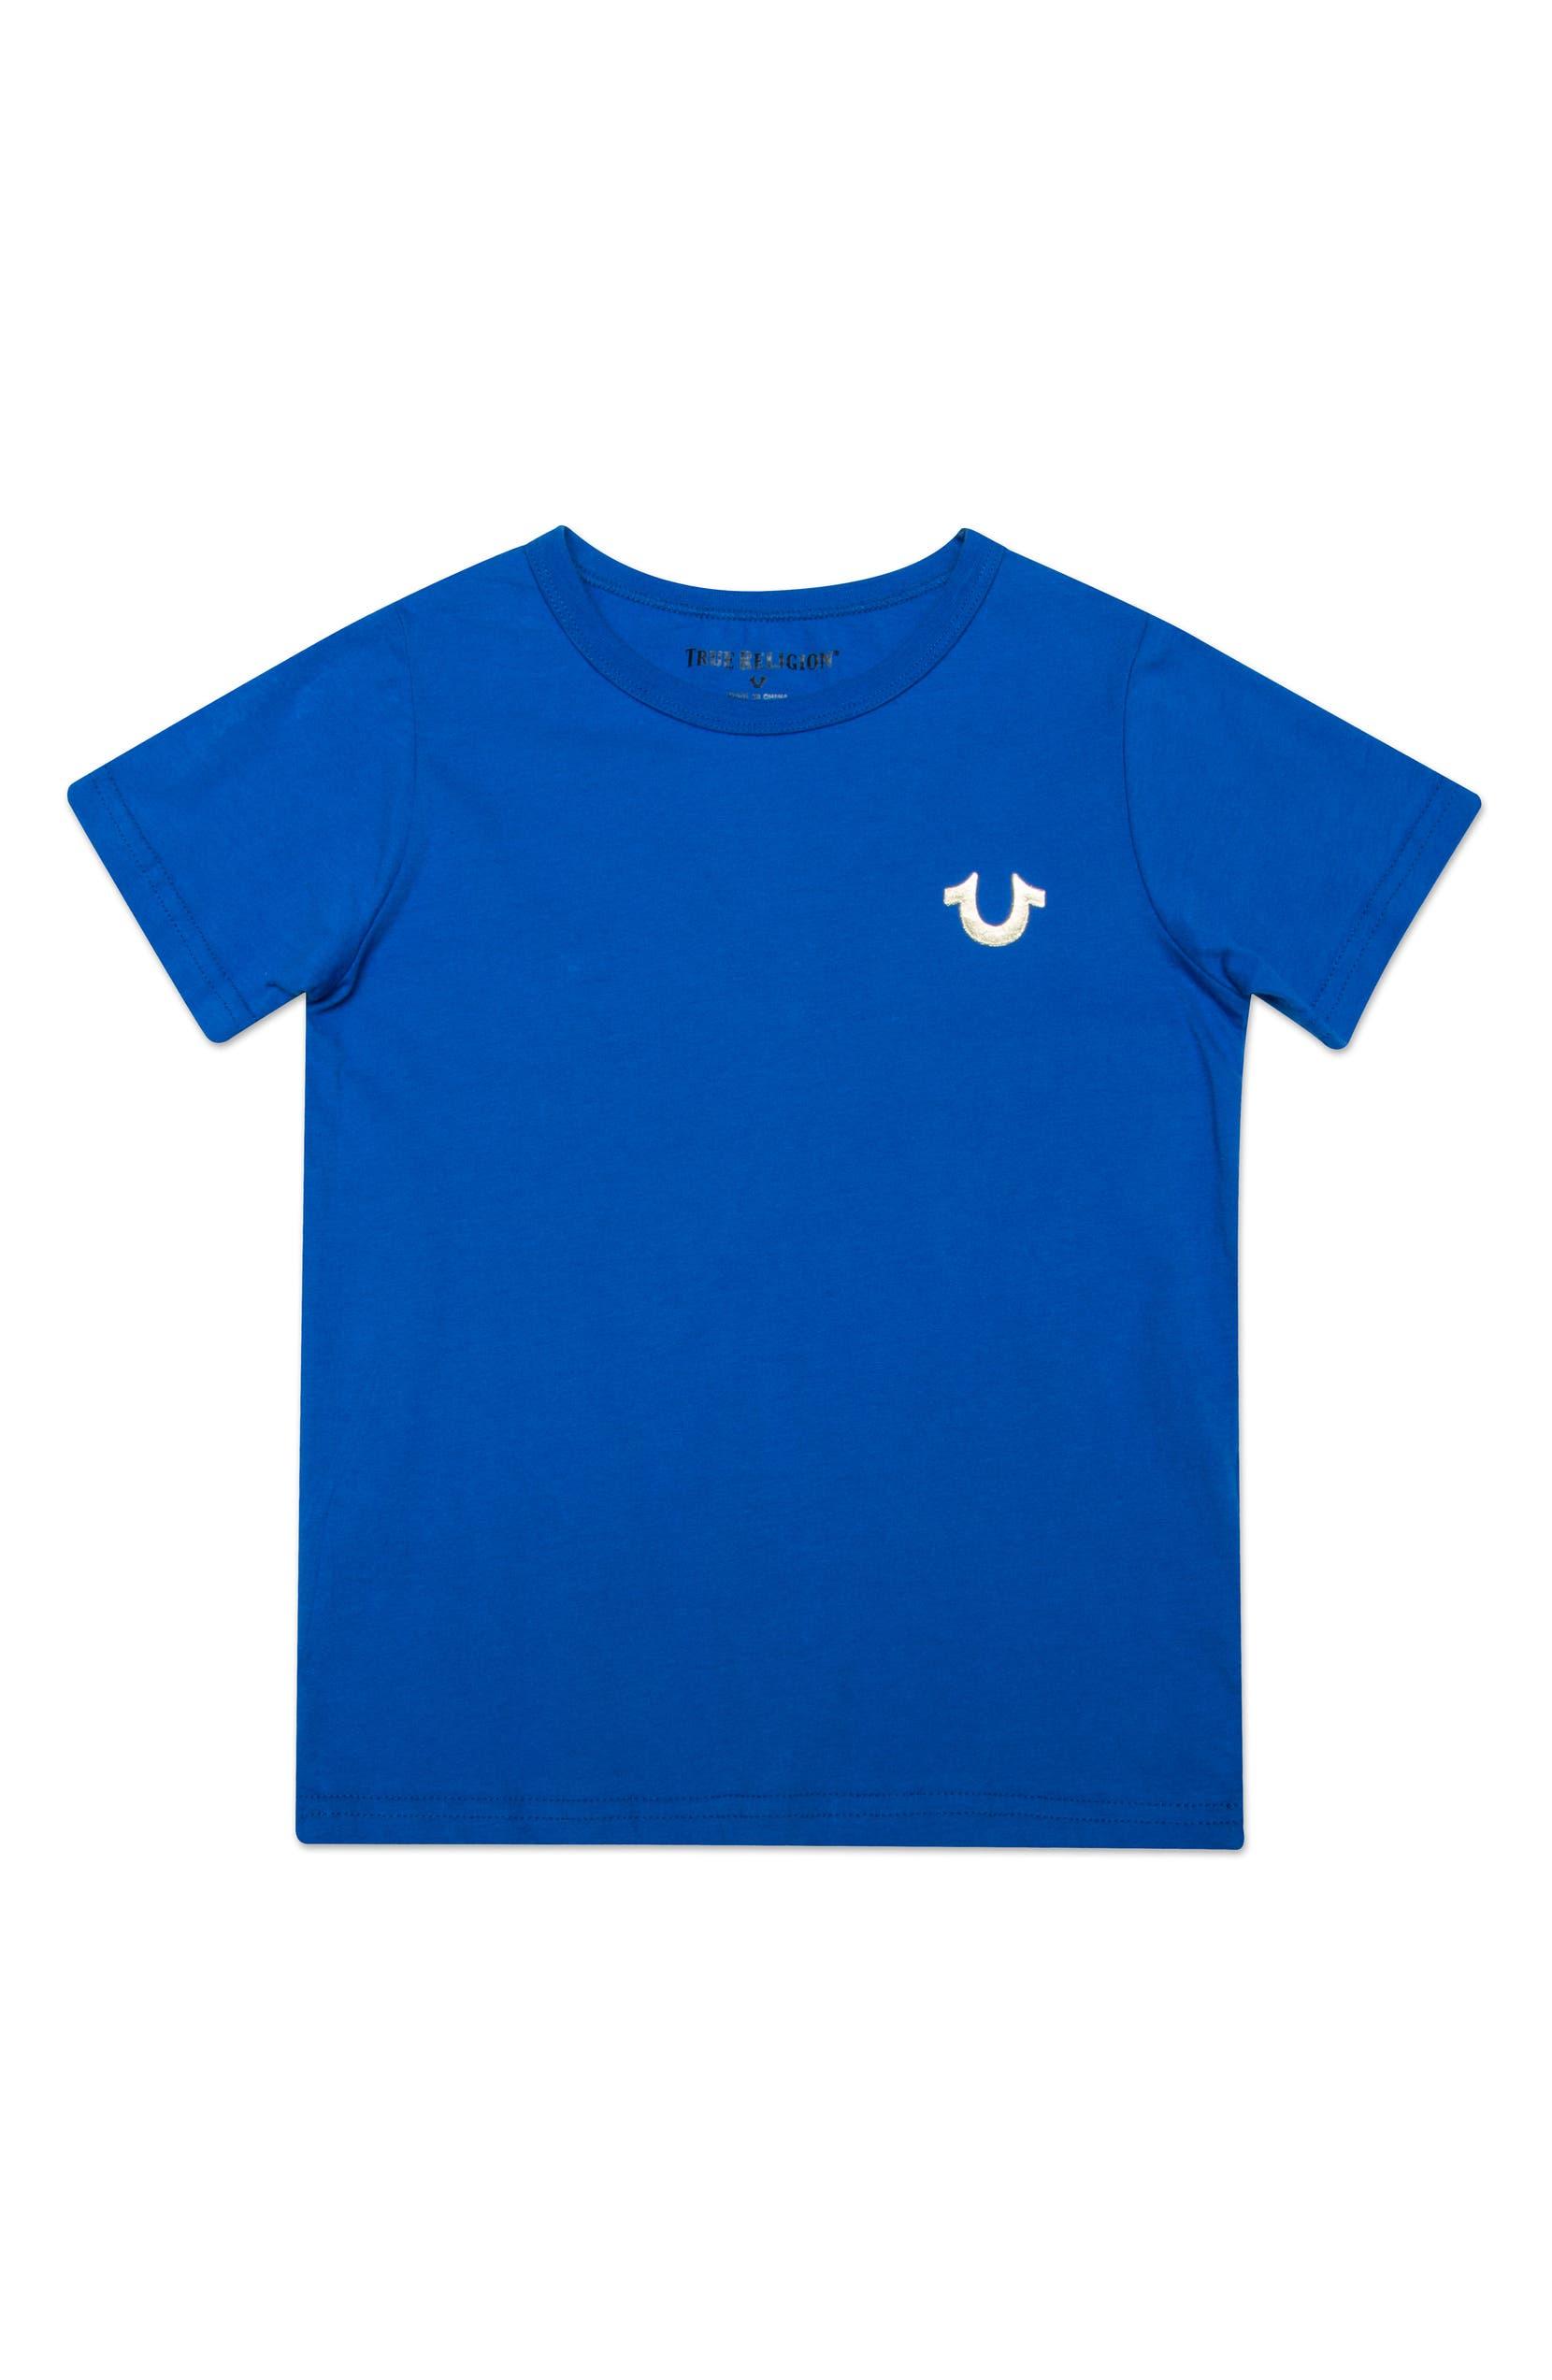 9c8ab2c138 True Religion Brand Jeans Gold Buddha Logo T-Shirt (Toddler Boys ...